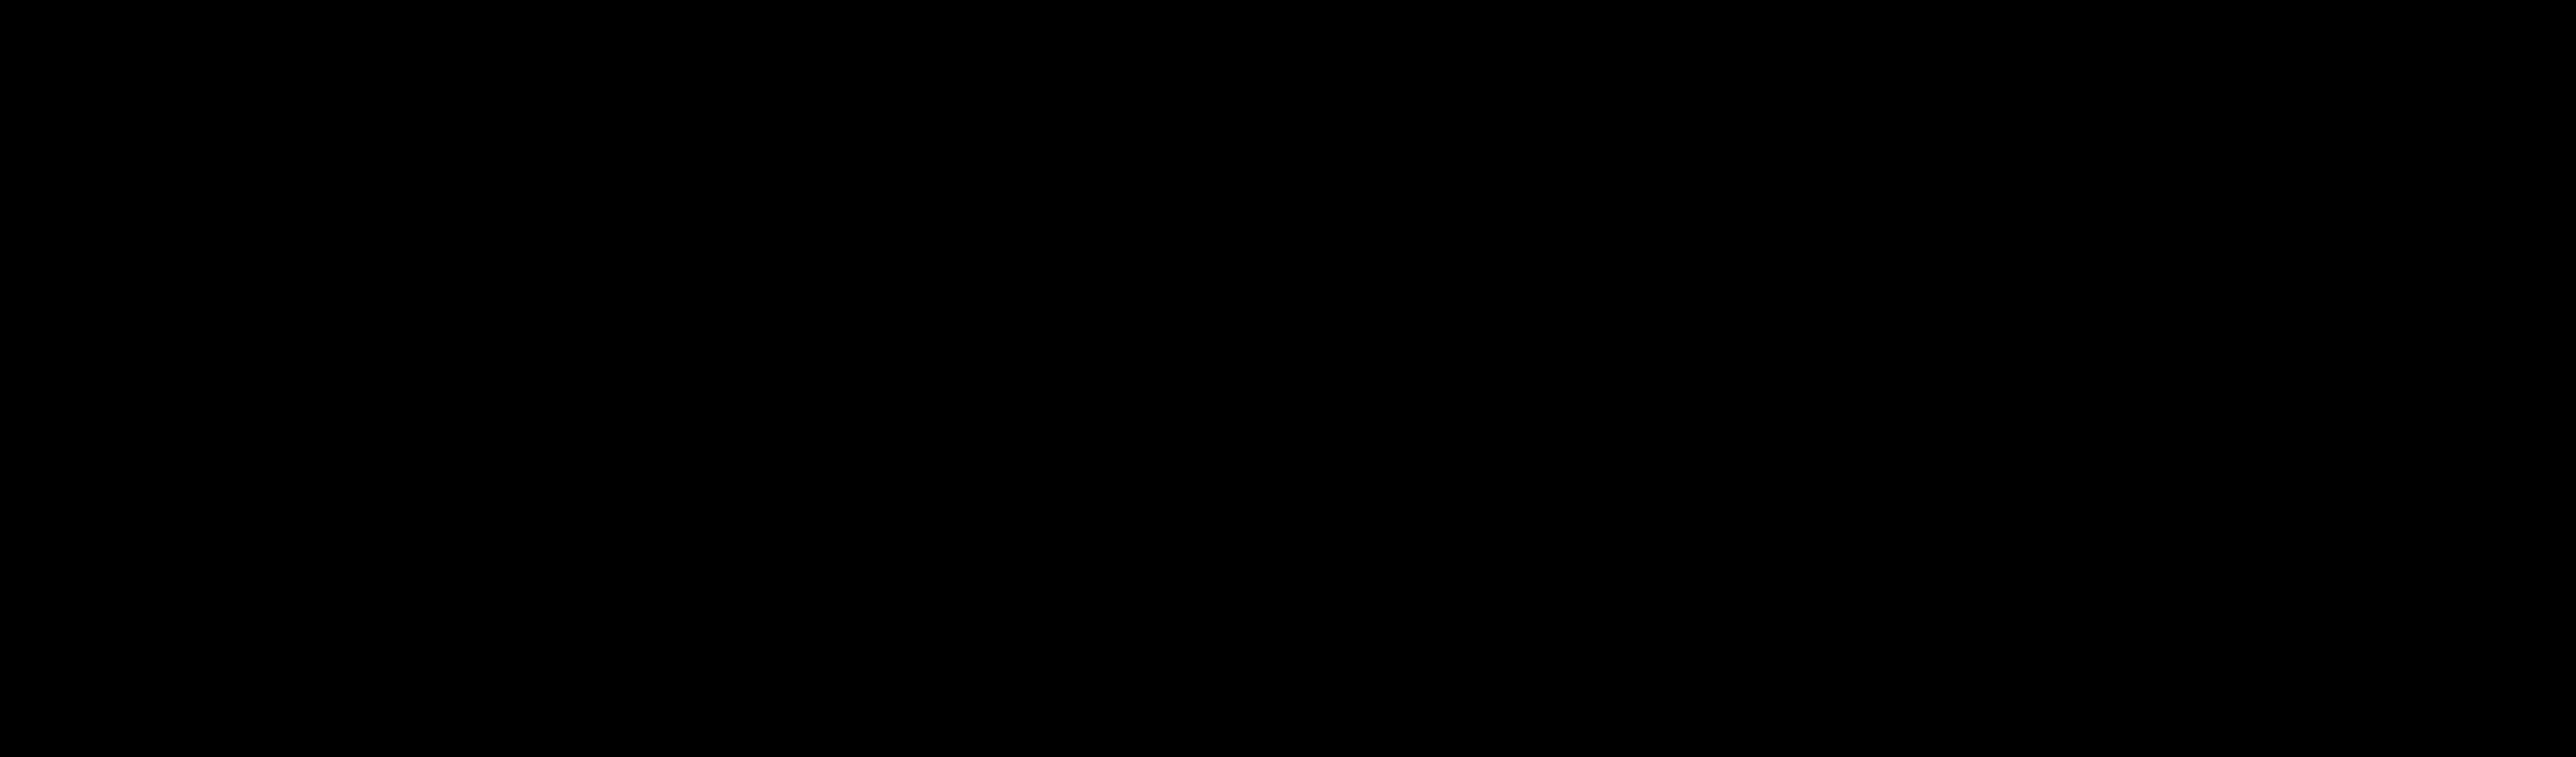 01_Nicole_Milano_Logo_Black_CMYK